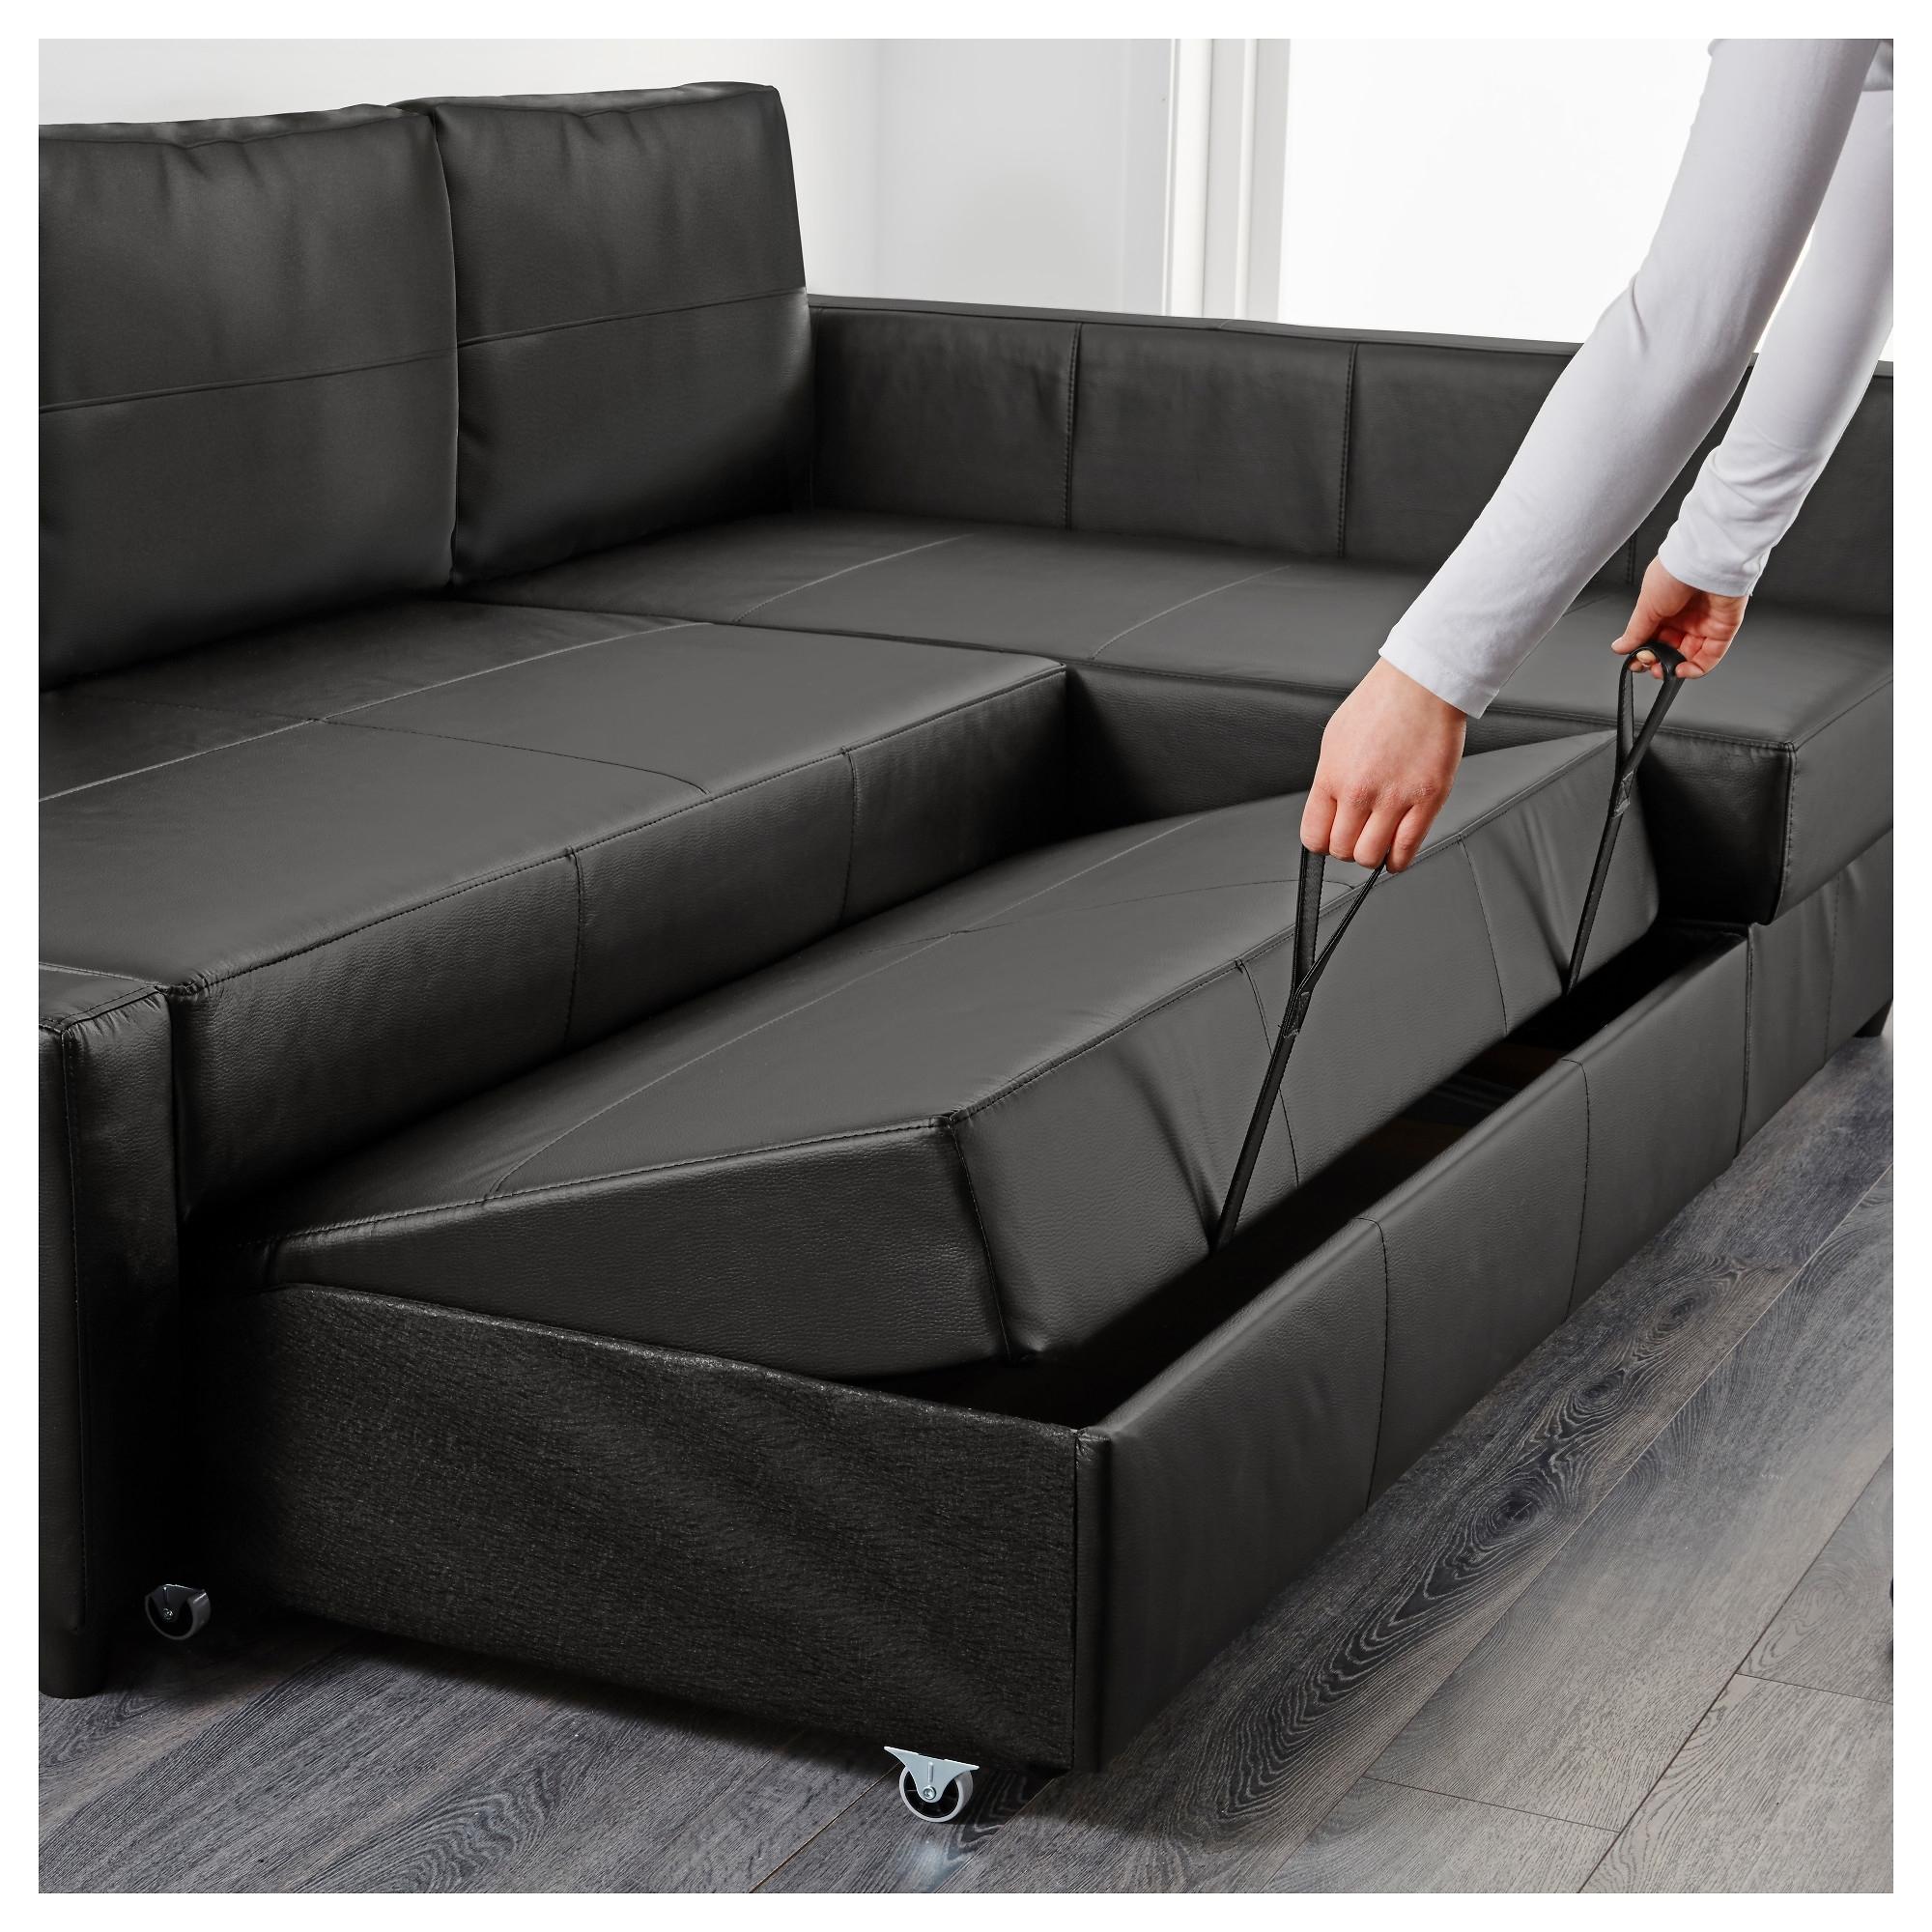 Friheten Corner Sofa Bed With Storage Bomstad Black – Ikea With 2017 Ikea Corner Sofas With Storage (View 5 of 15)